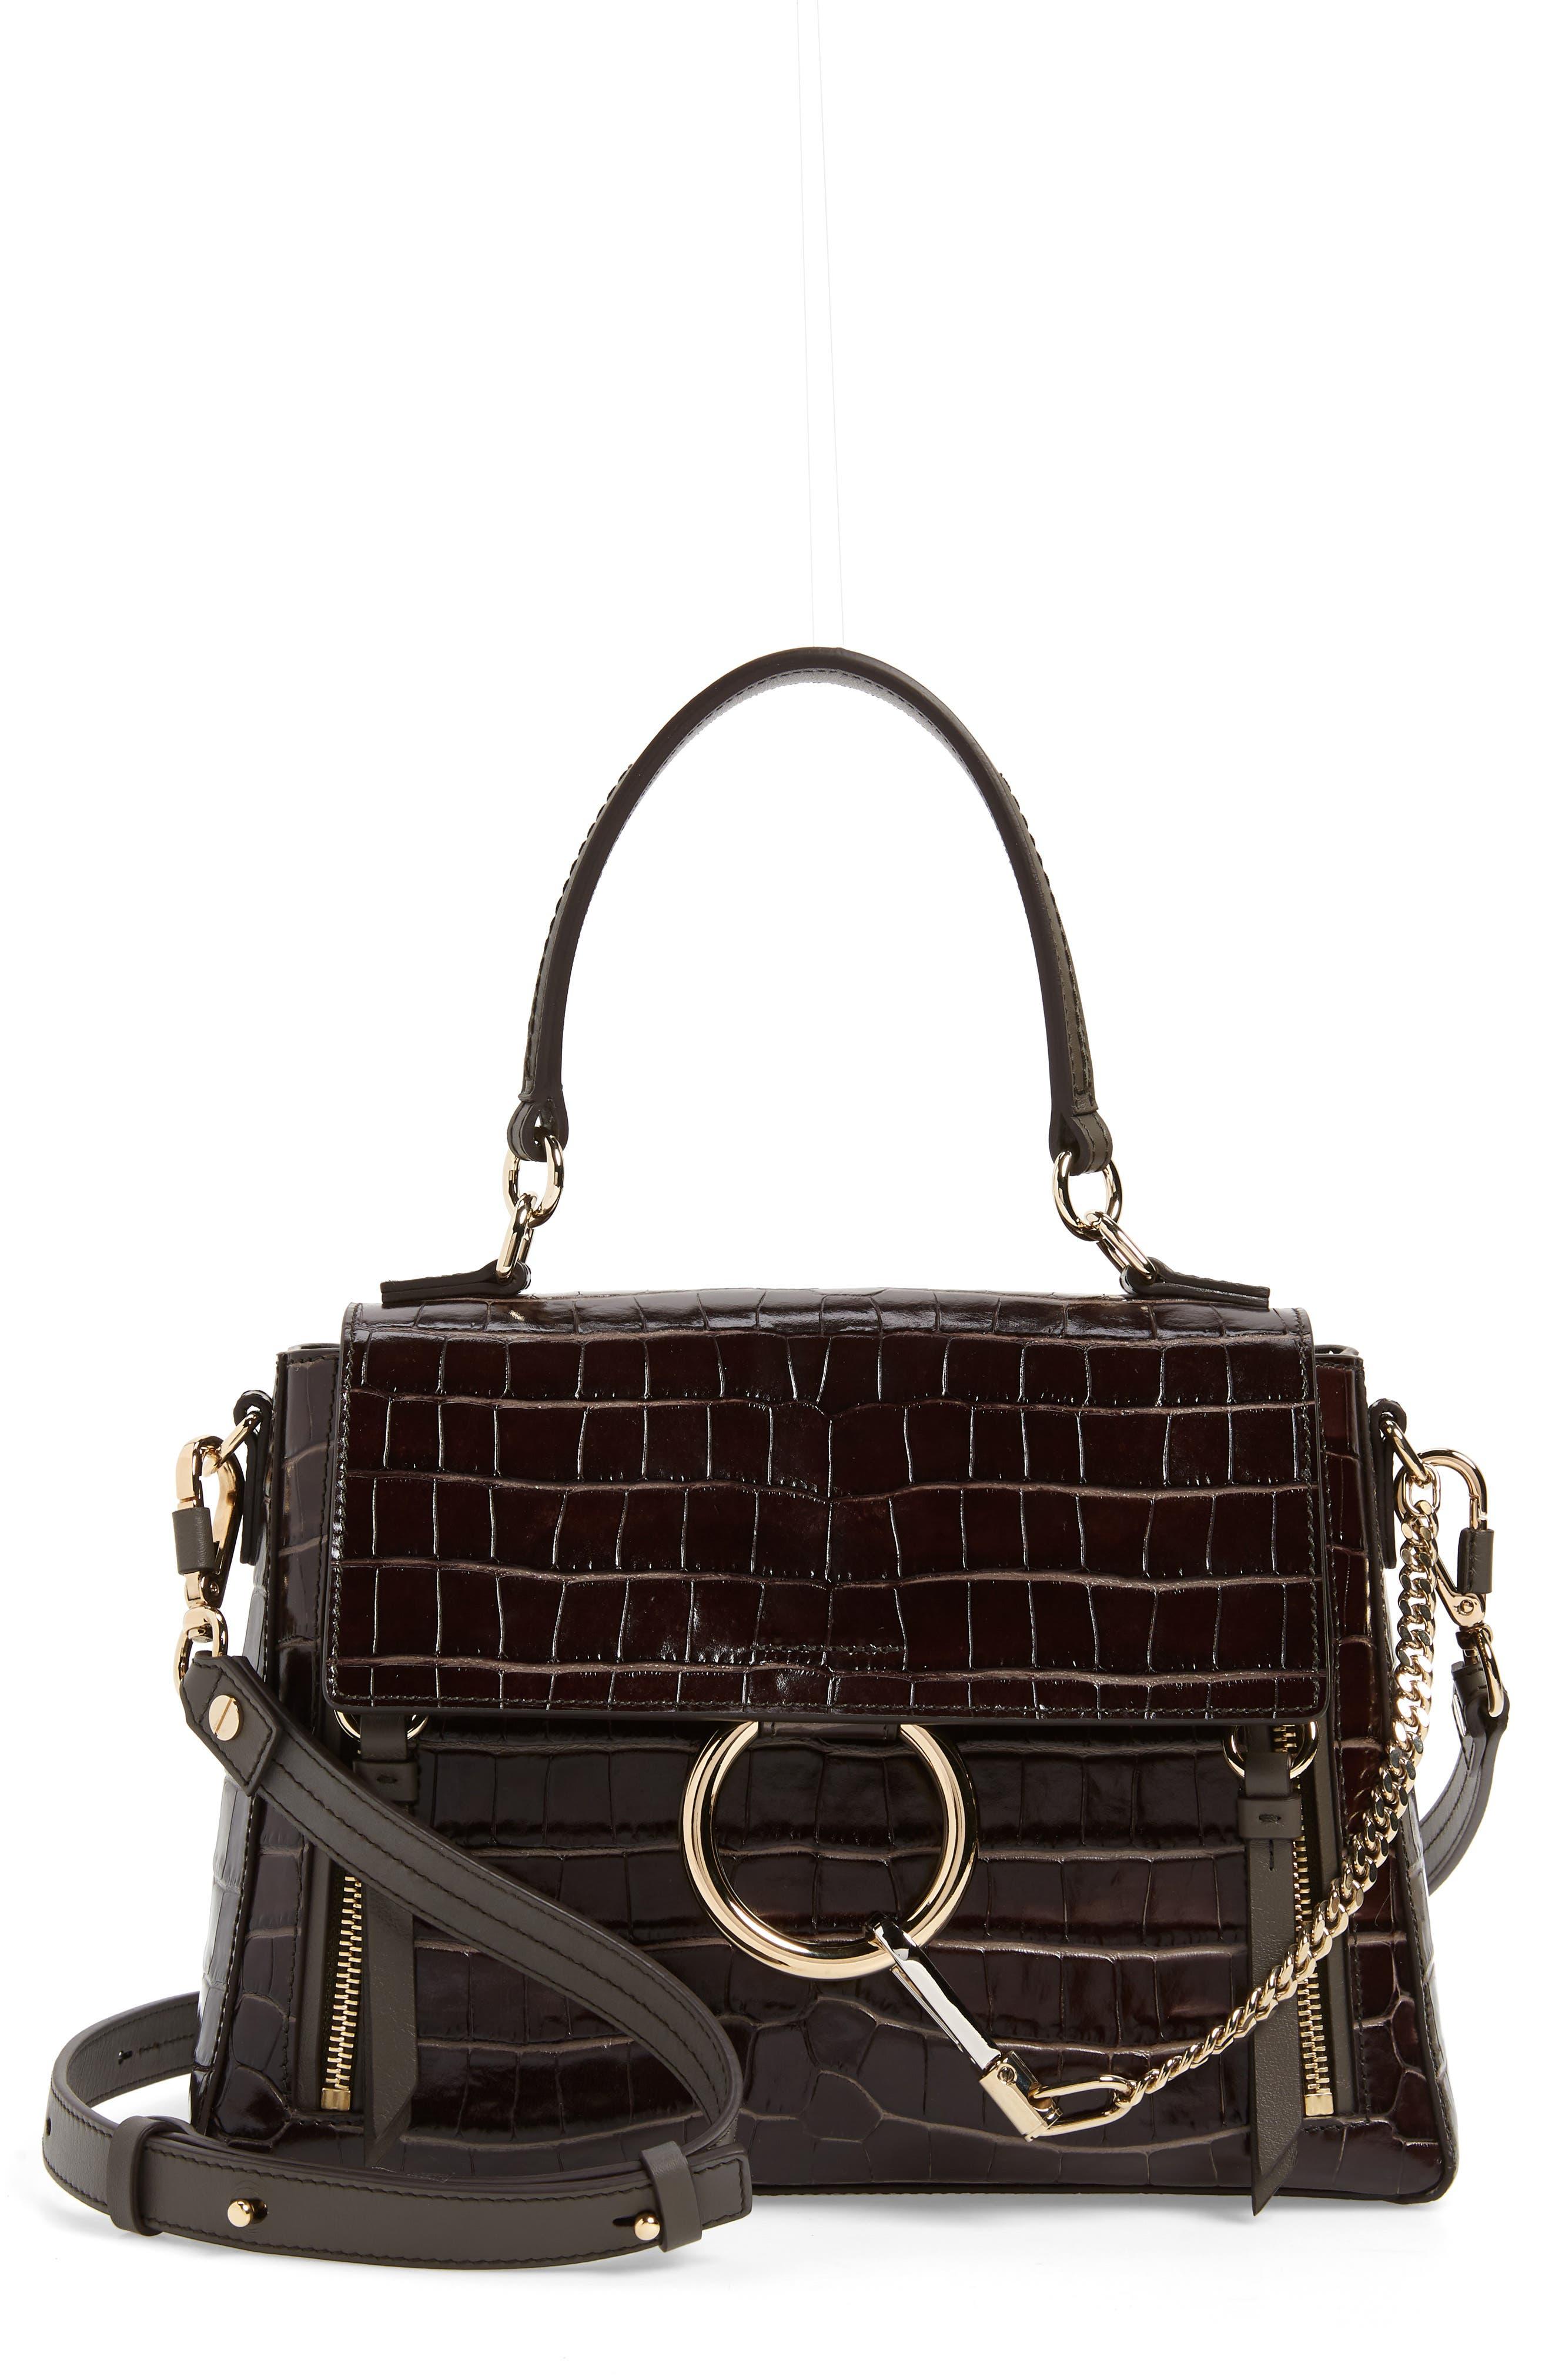 Medium Faye Day Croc Embossed Leather Shoulder Bag, Main, color, PROFOUND BROWN